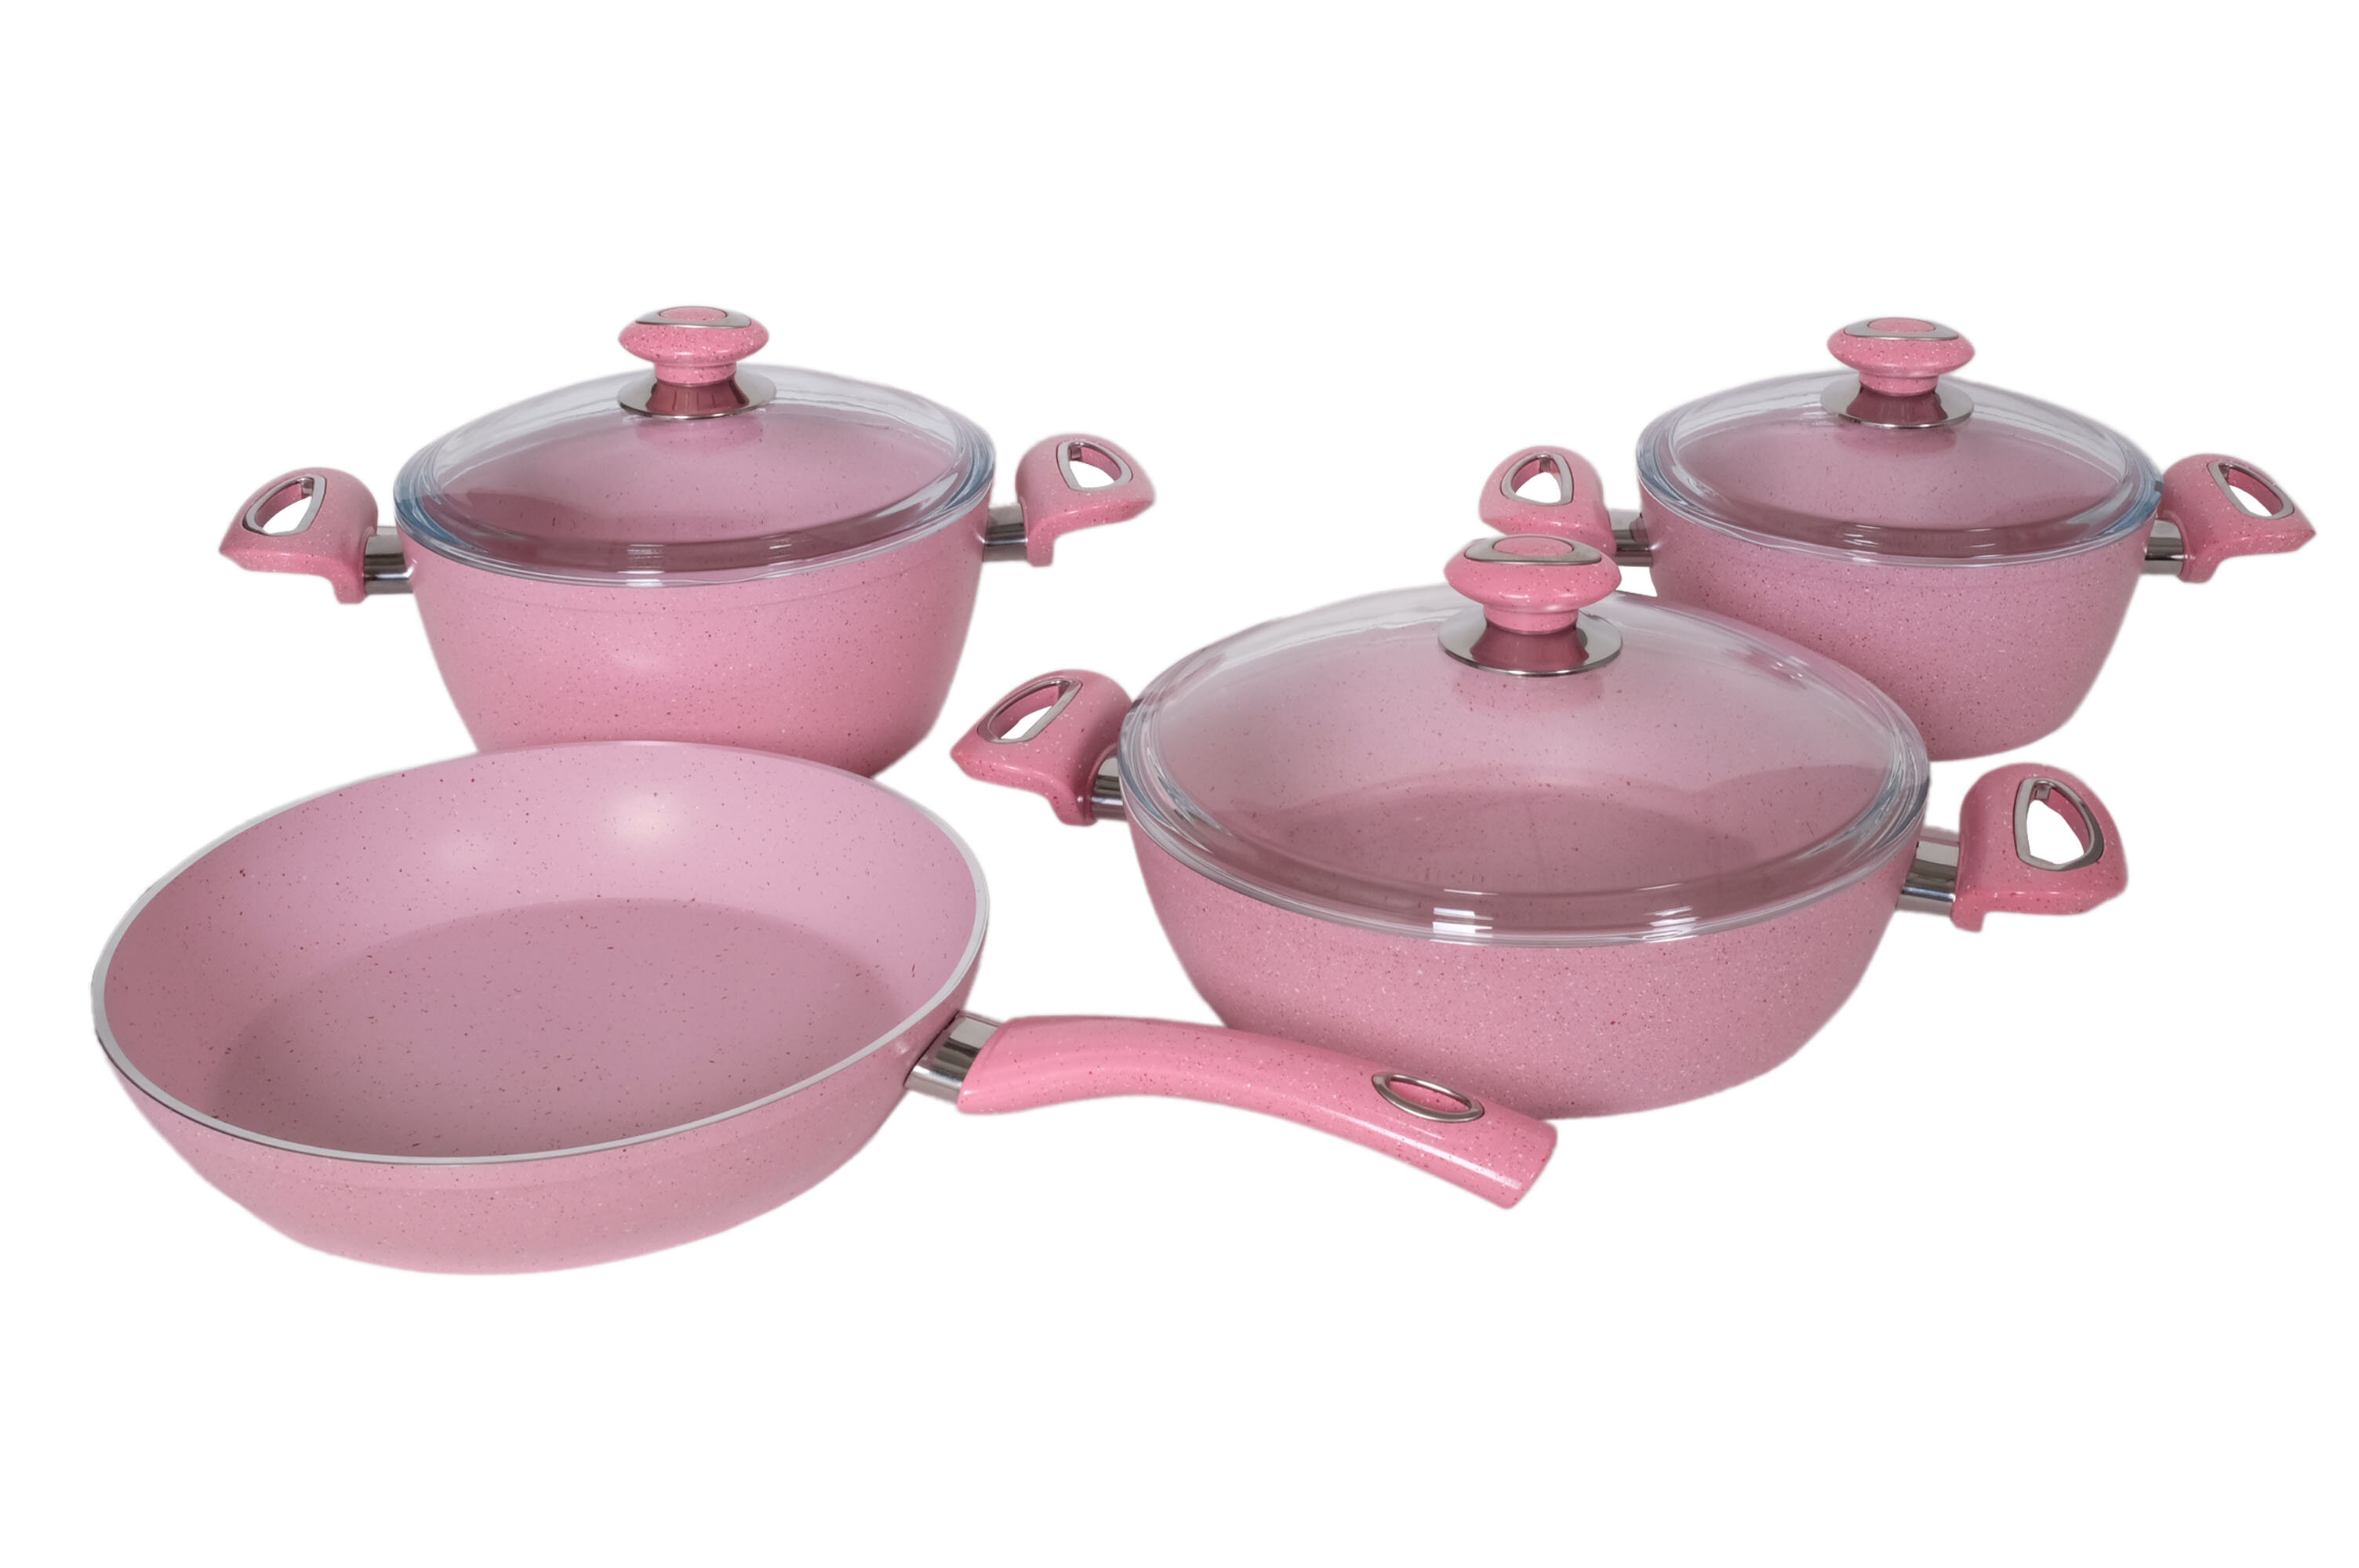 Casserole Induction Compatible Vitroceramique homedora fiesta 7 piece non stick cookware set